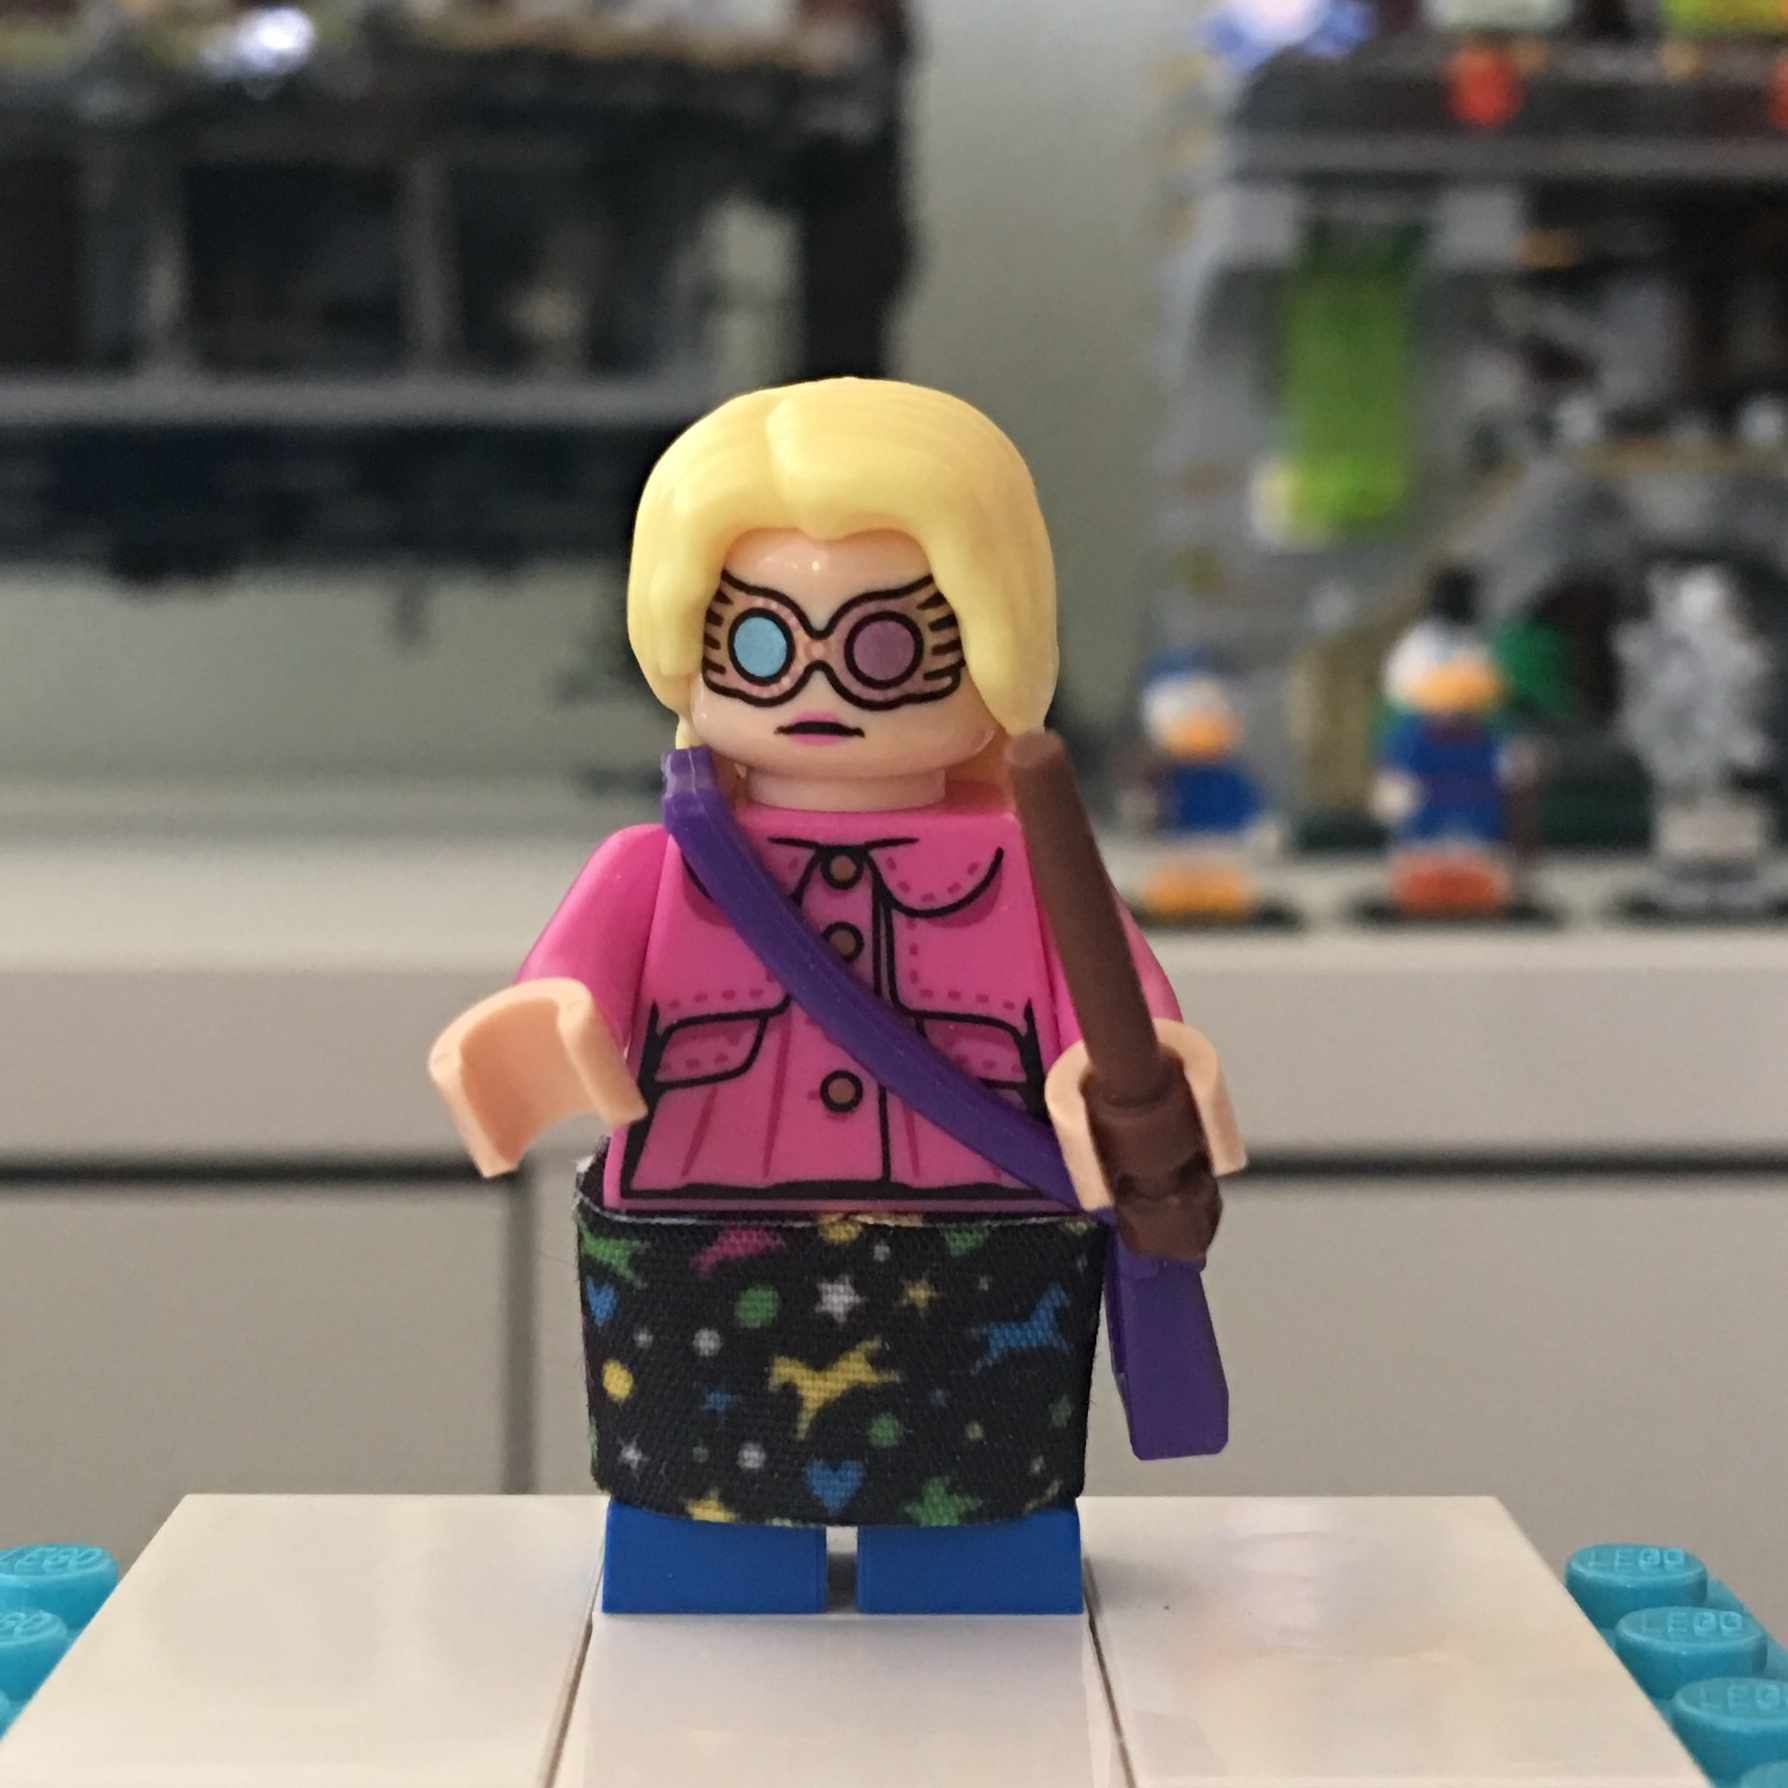 Spectrespecs // No Spectrespecs - LEGO Head Pink Lips Luna Lovegood Minifig